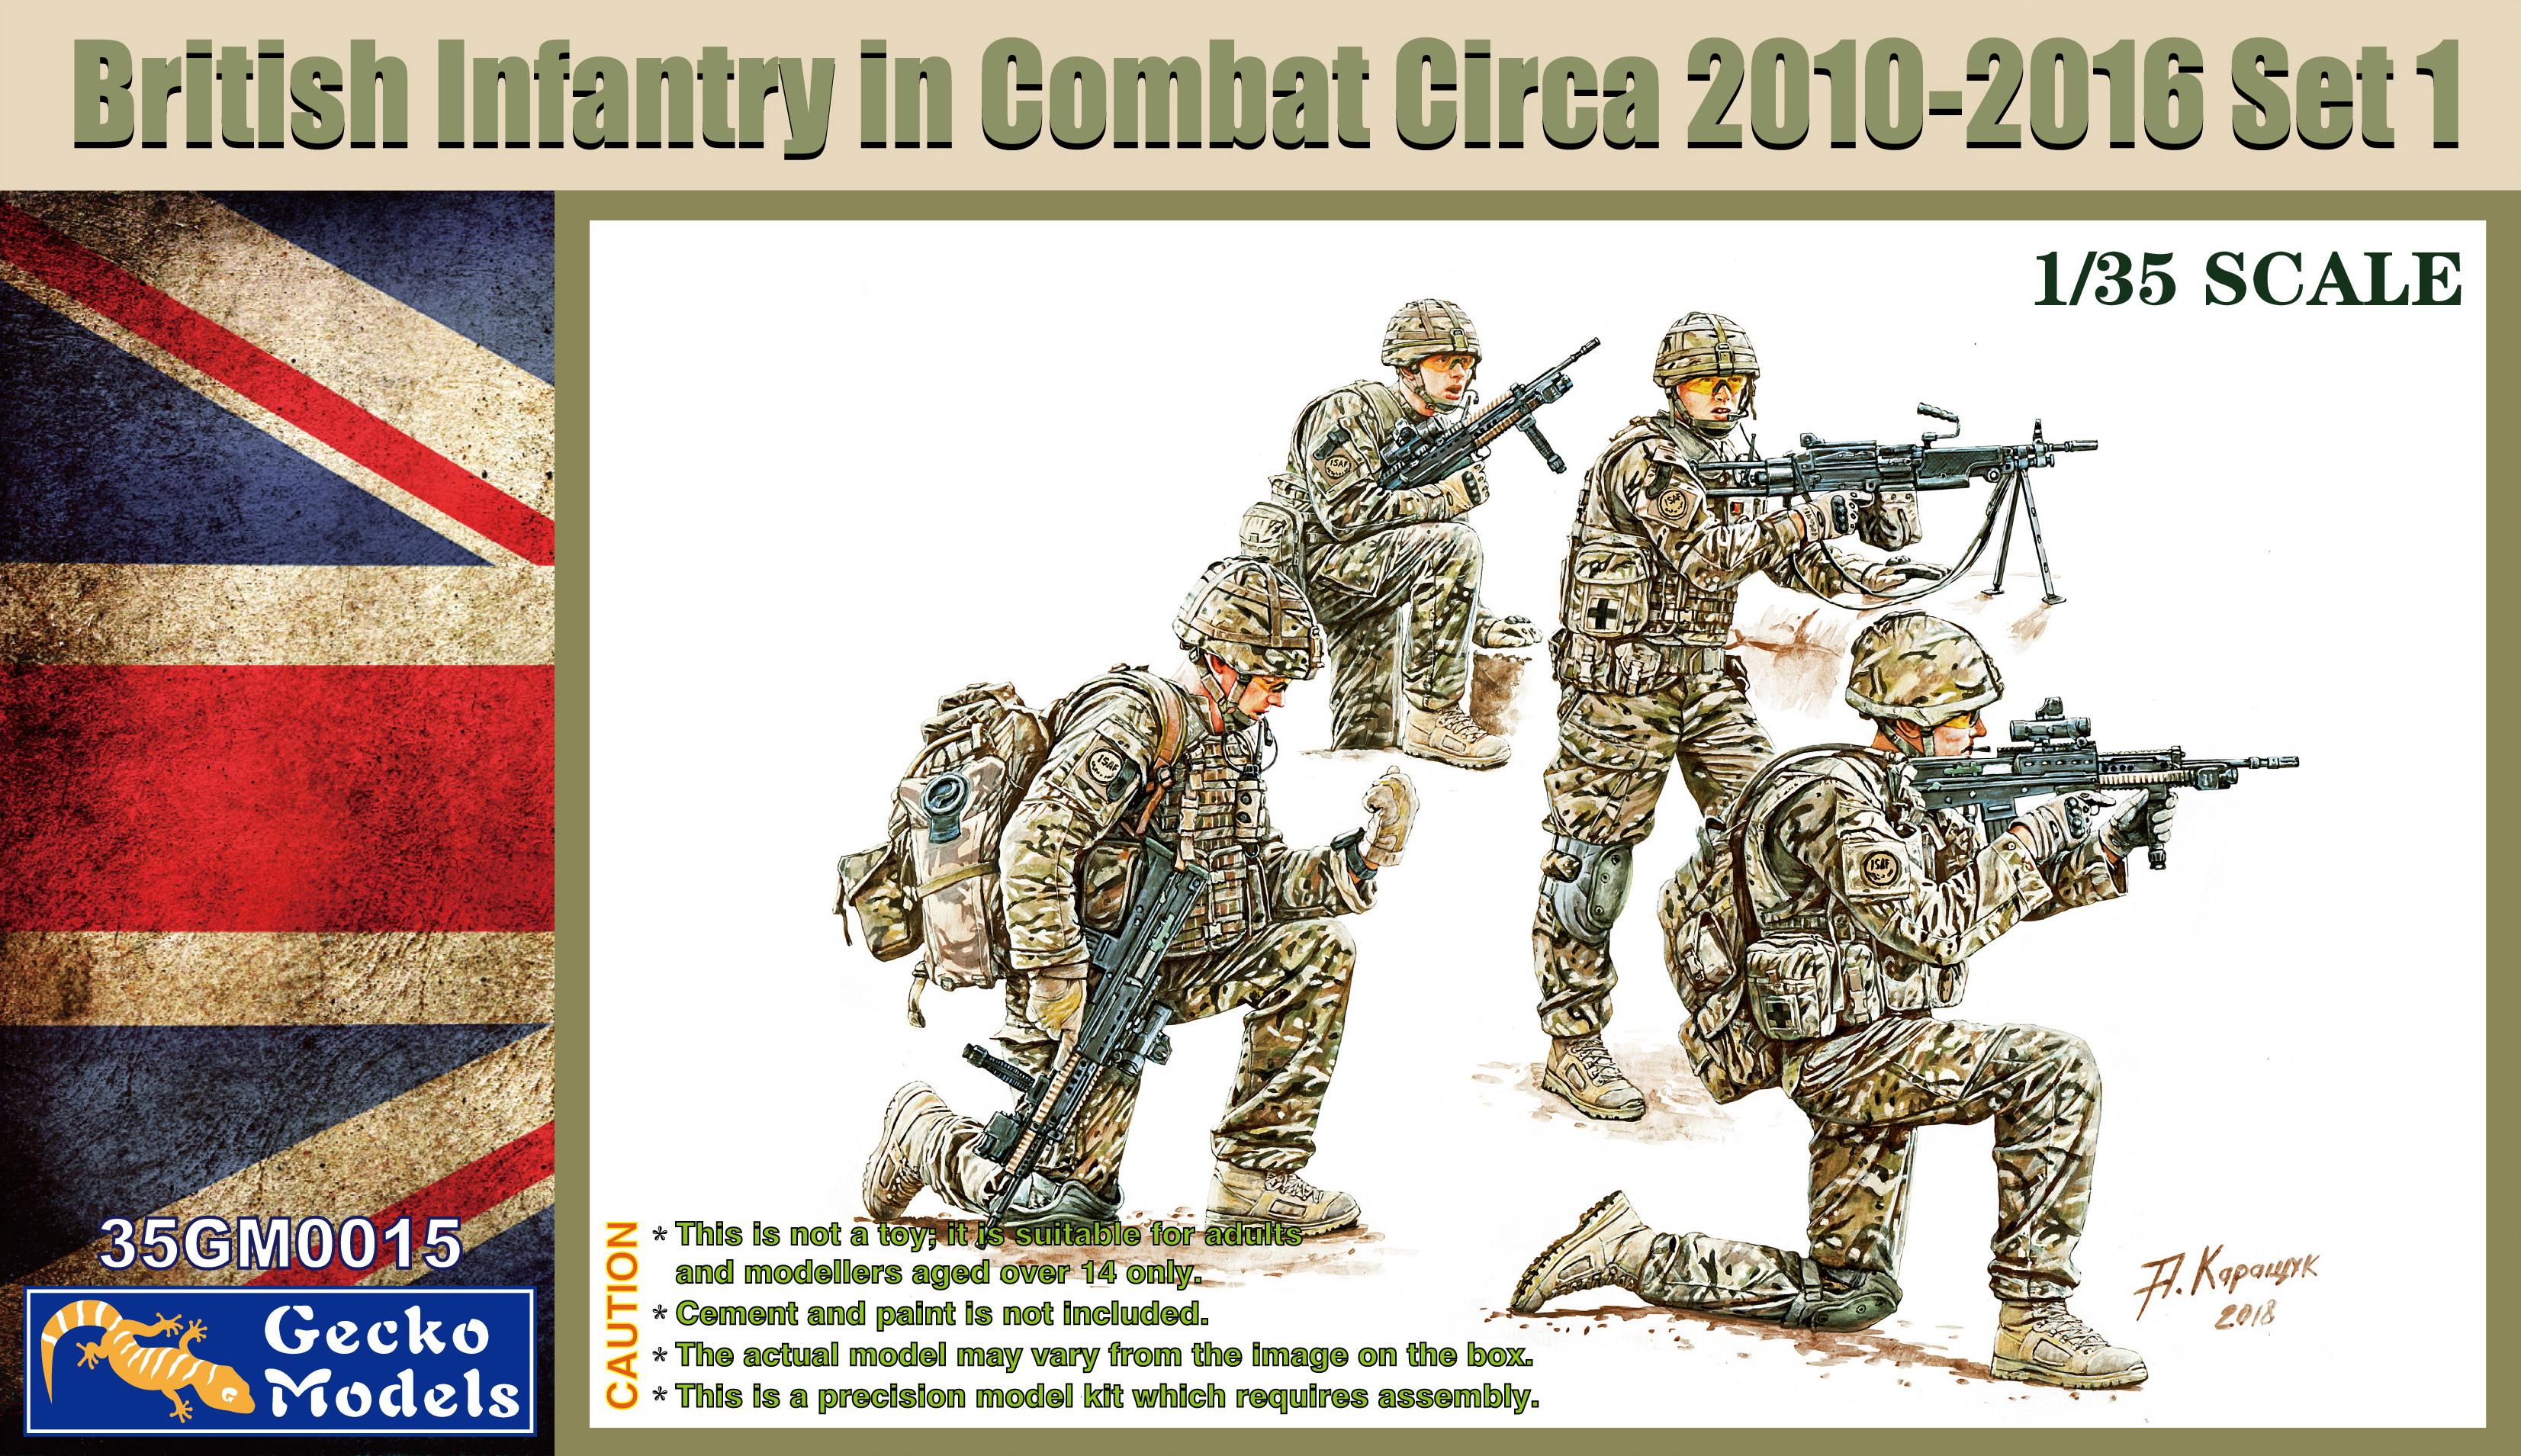 Gecko 1/35 British Infantry In Combat Circa 2010~2012 Set 1